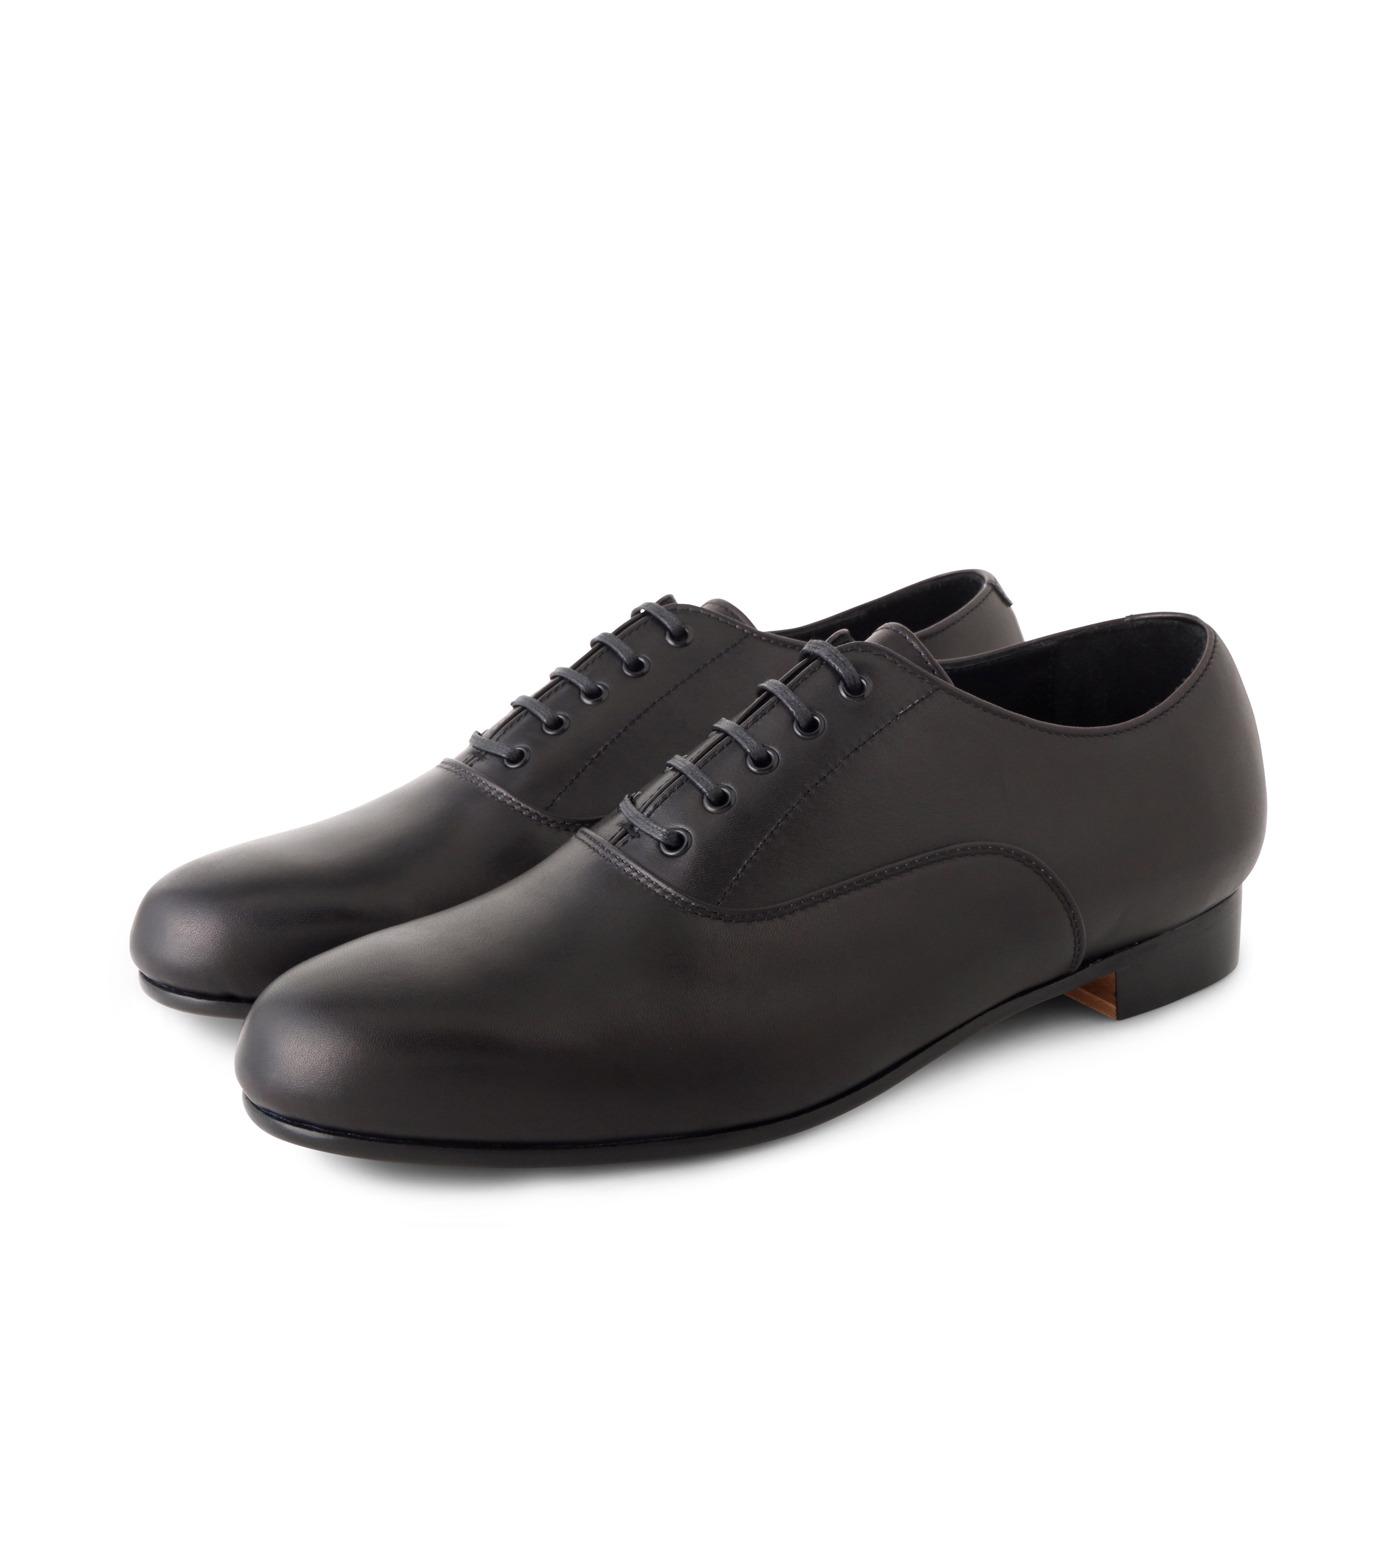 RAINMAKER(レインメーカー)のoxford shoes-BLACK(シューズ/shoes)-RM162-020-13 拡大詳細画像3